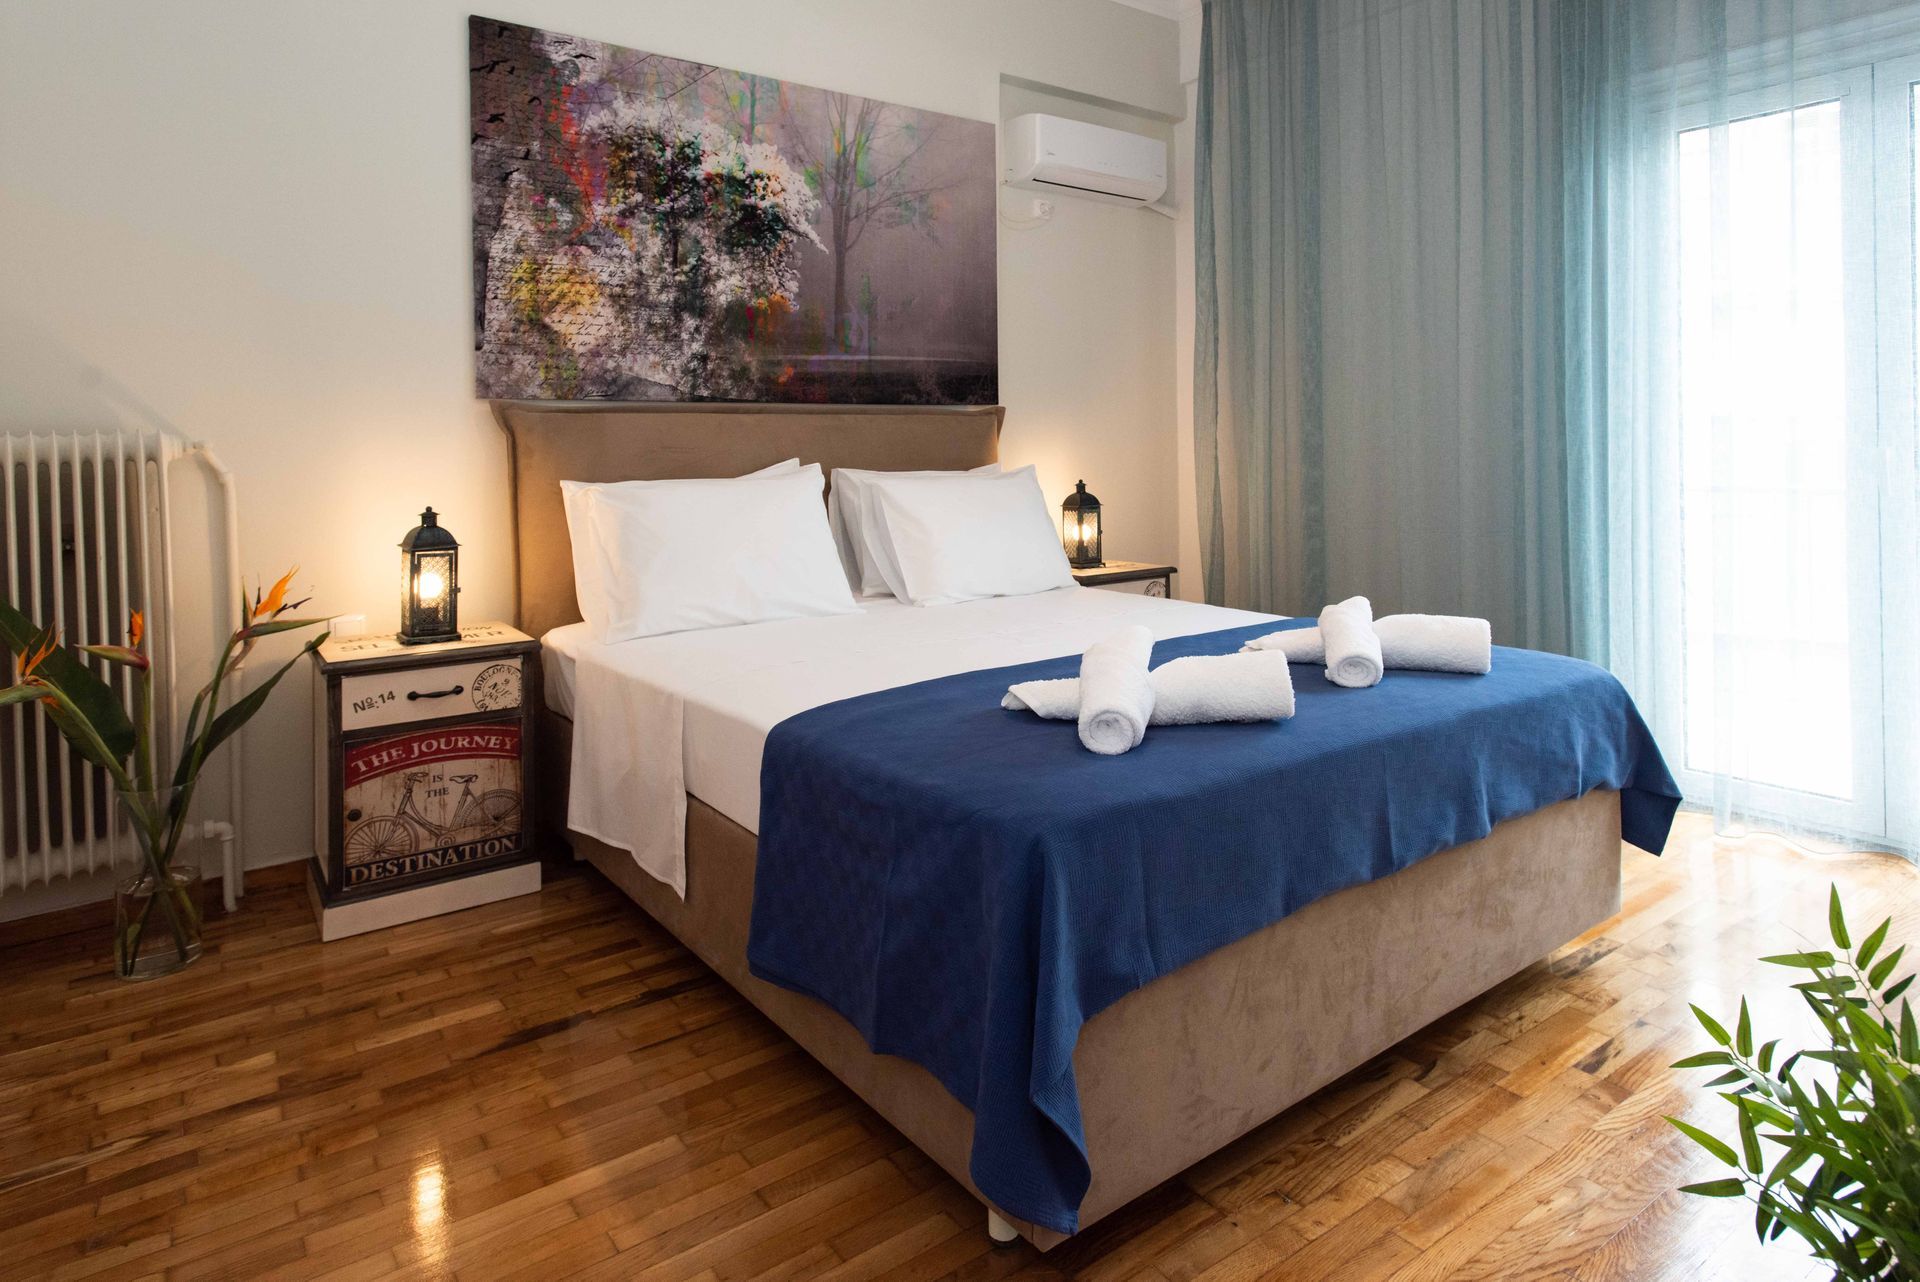 Blue Ark Stylish Athens - Αθήνα ✦ 2 Ημέρες (1 Διανυκτέρευση) ✦ 2 άτομα ✦ Χωρίς Πρωινό ✦ έως 28/04/2021 ✦ Free WiFi!